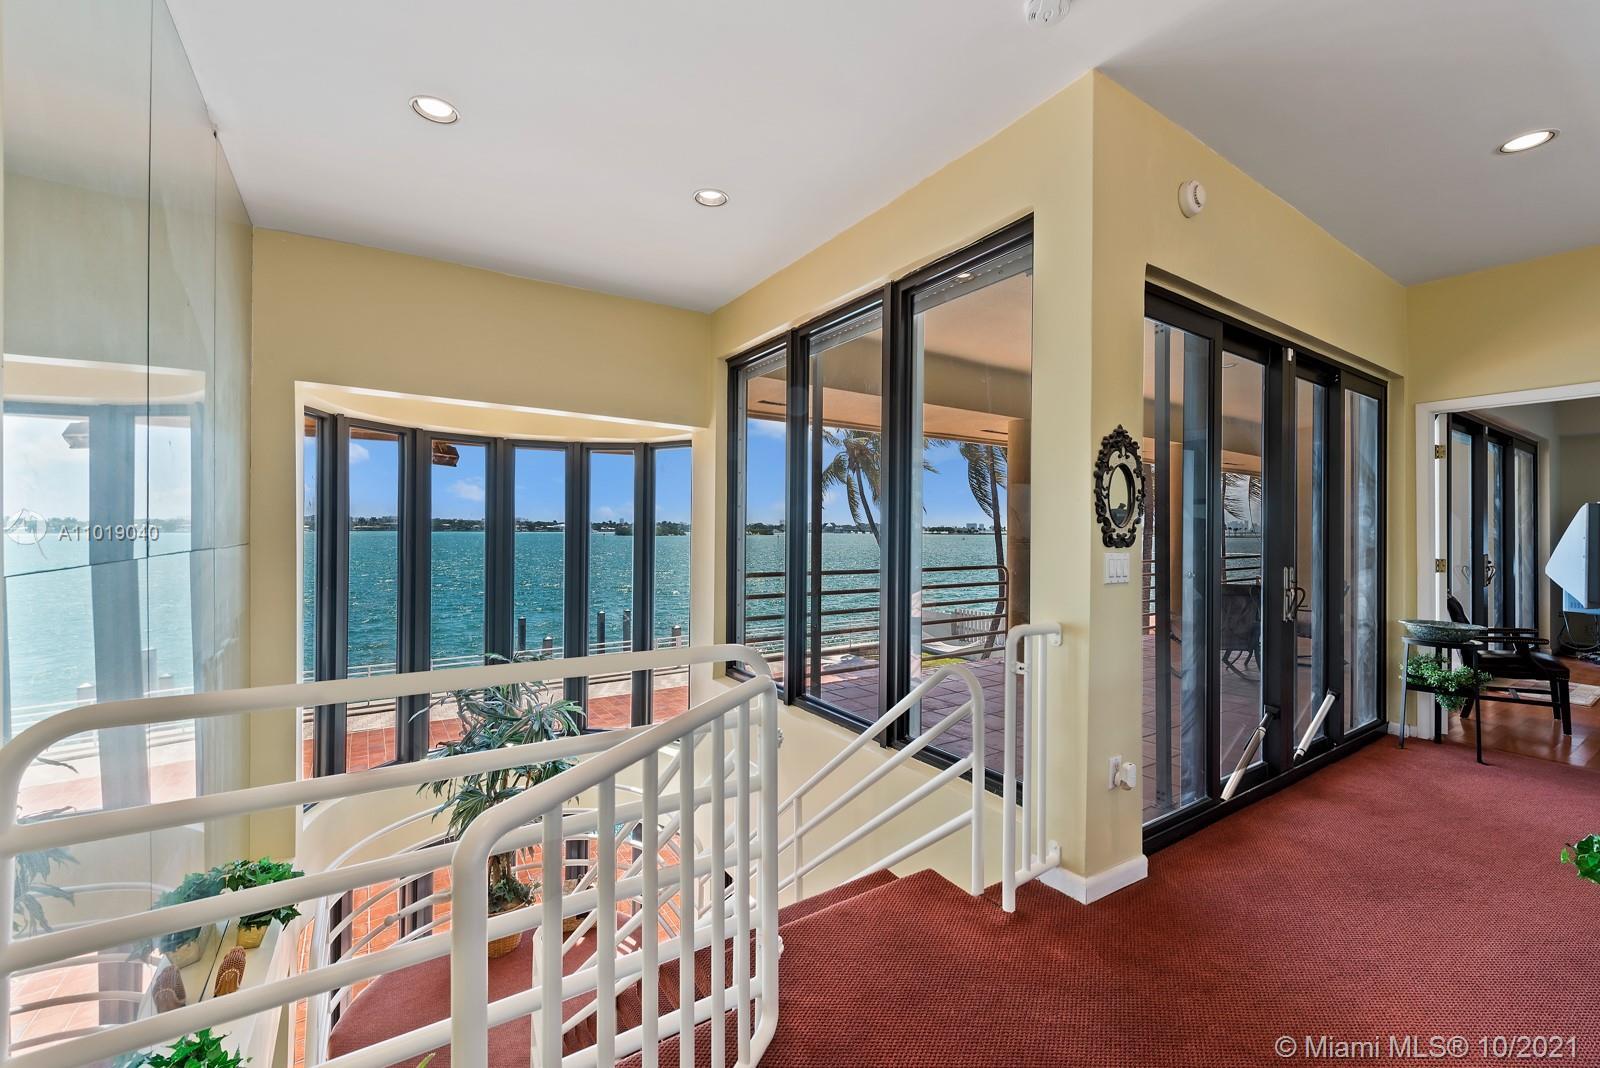 Main property image for  13155 Biscayne Bay Dr